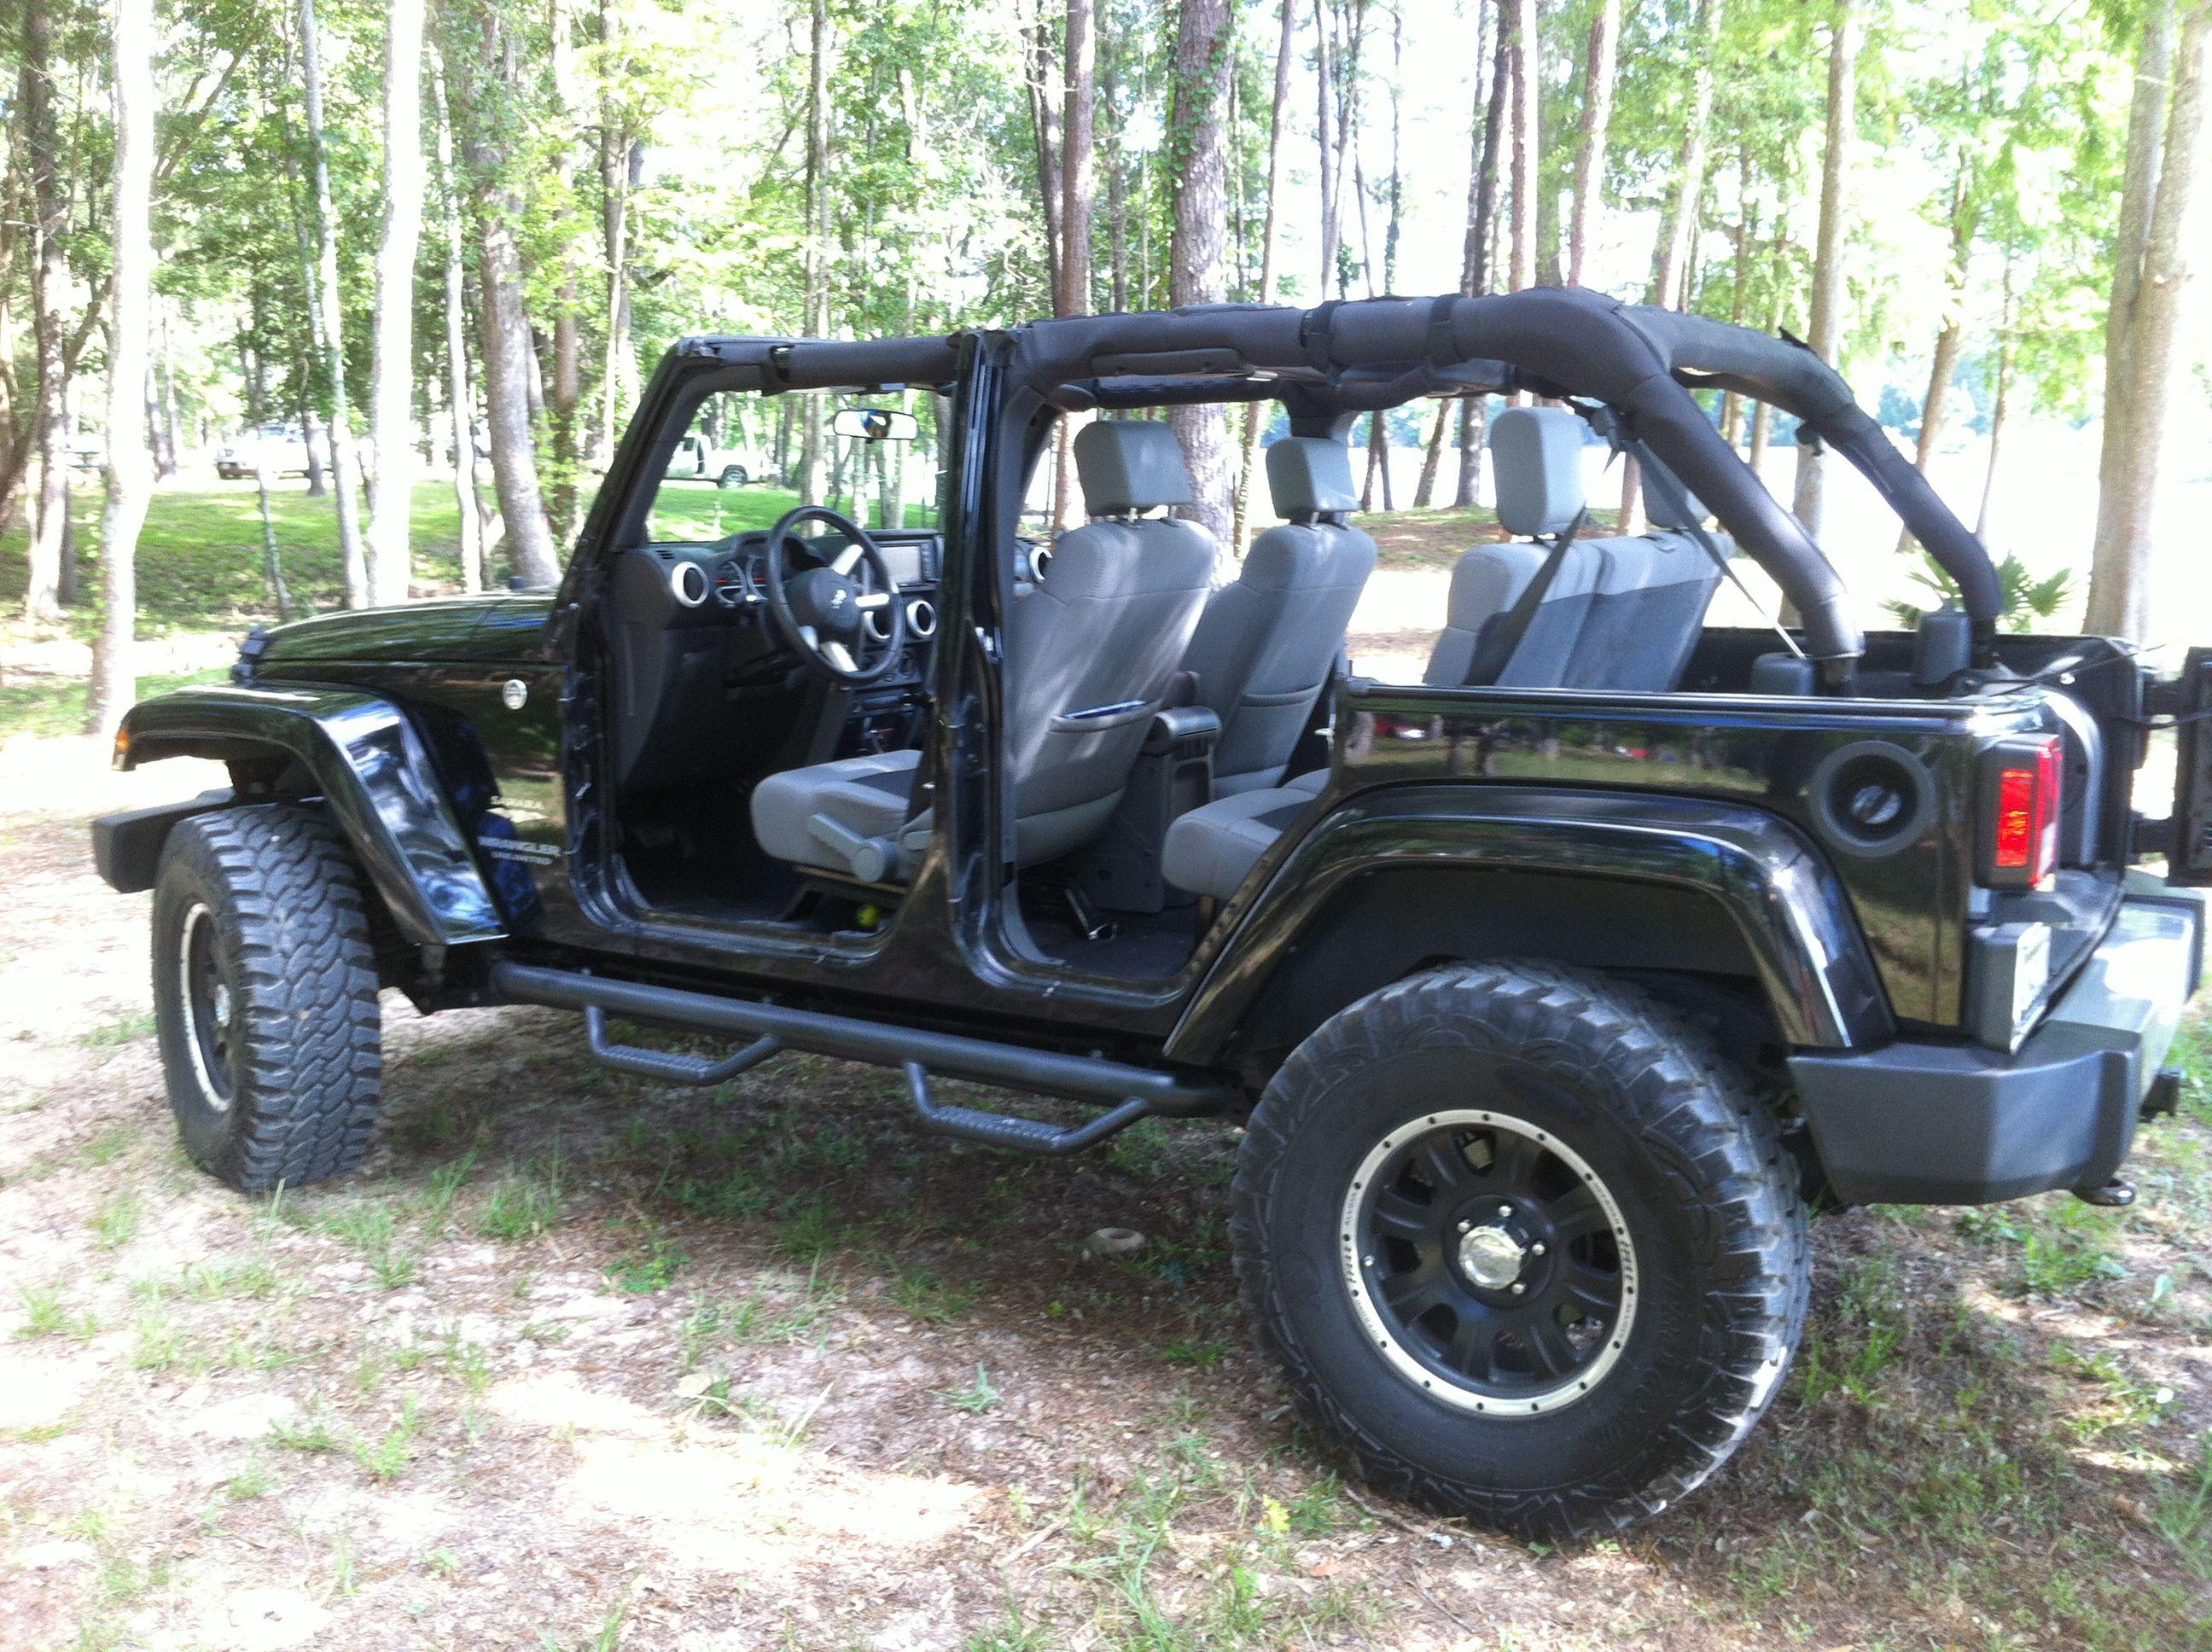 2010 Jeep Wrangler Unlimited Sahara Edition Jeep Wrangler Unlimited 2010 Jeep Wrangler Jeep Wrangler Unlimited Sahara